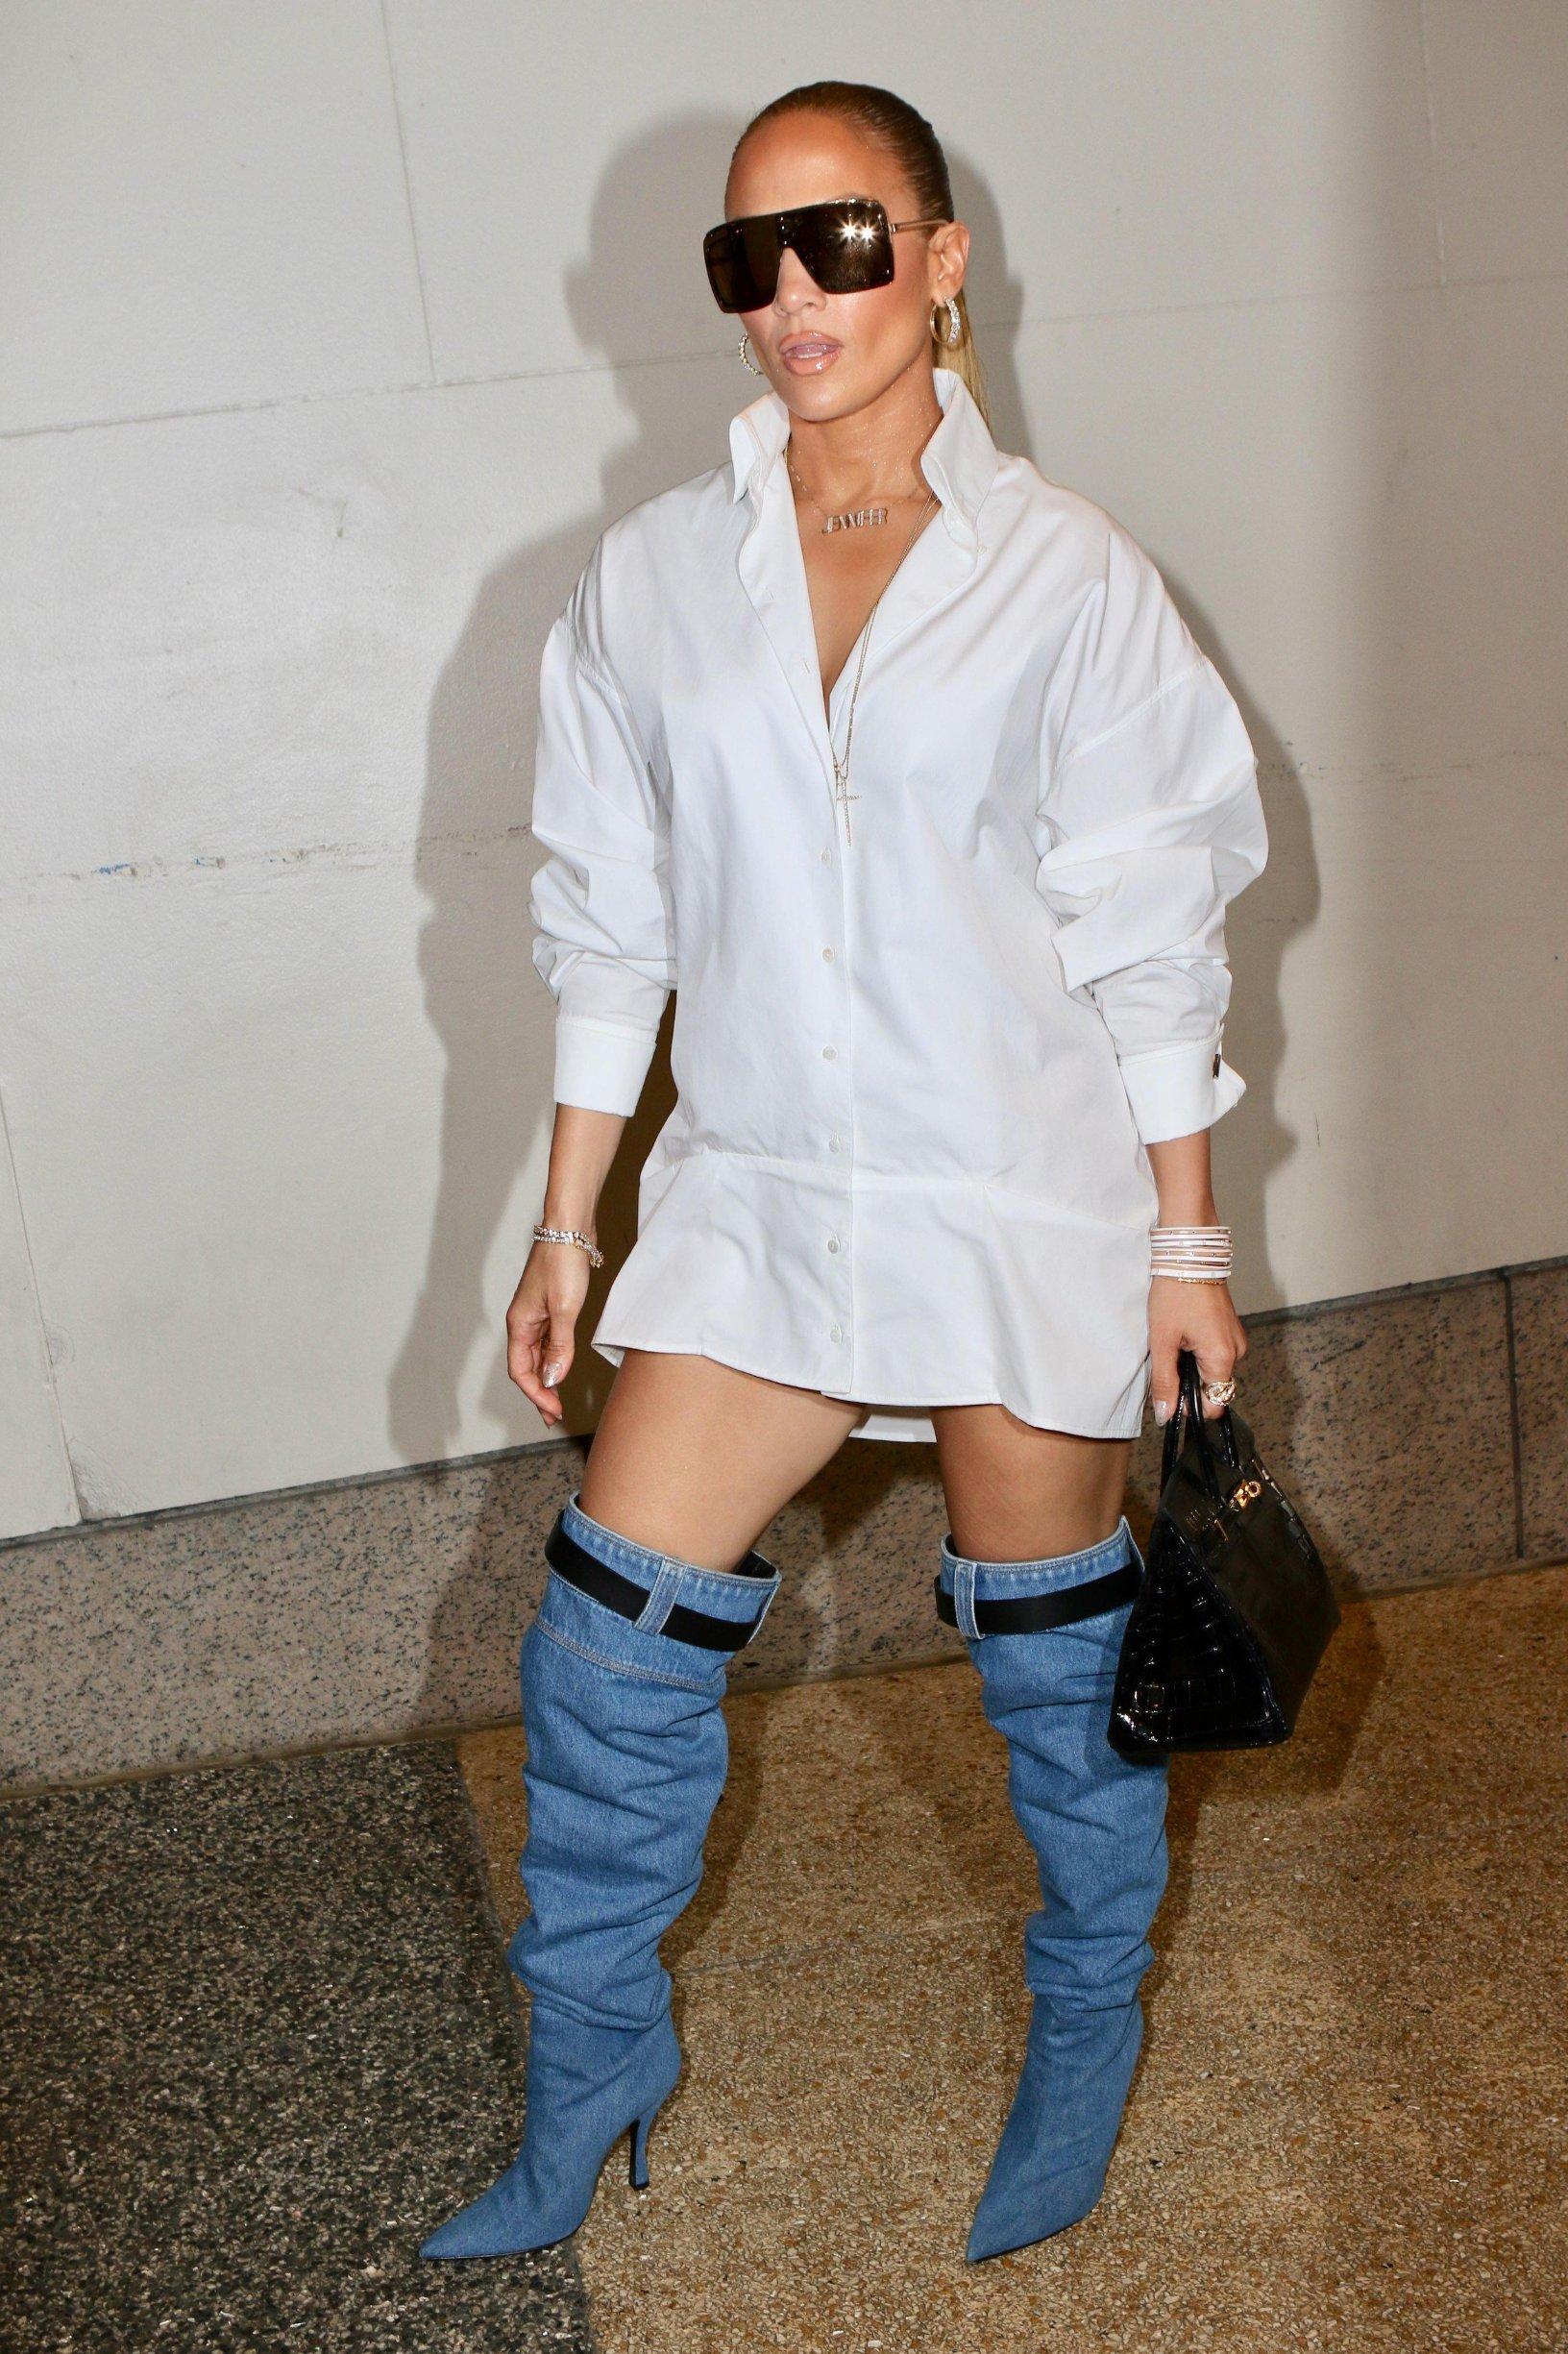 , New York, NY - 20180731 -  Jennifer Lopez at TRL  -PICTURED: Jennifer Lopez -, Image: 380449422, License: Rights-managed, Restrictions: , Model Release: no, Credit line: Profimedia, INSTAR Images